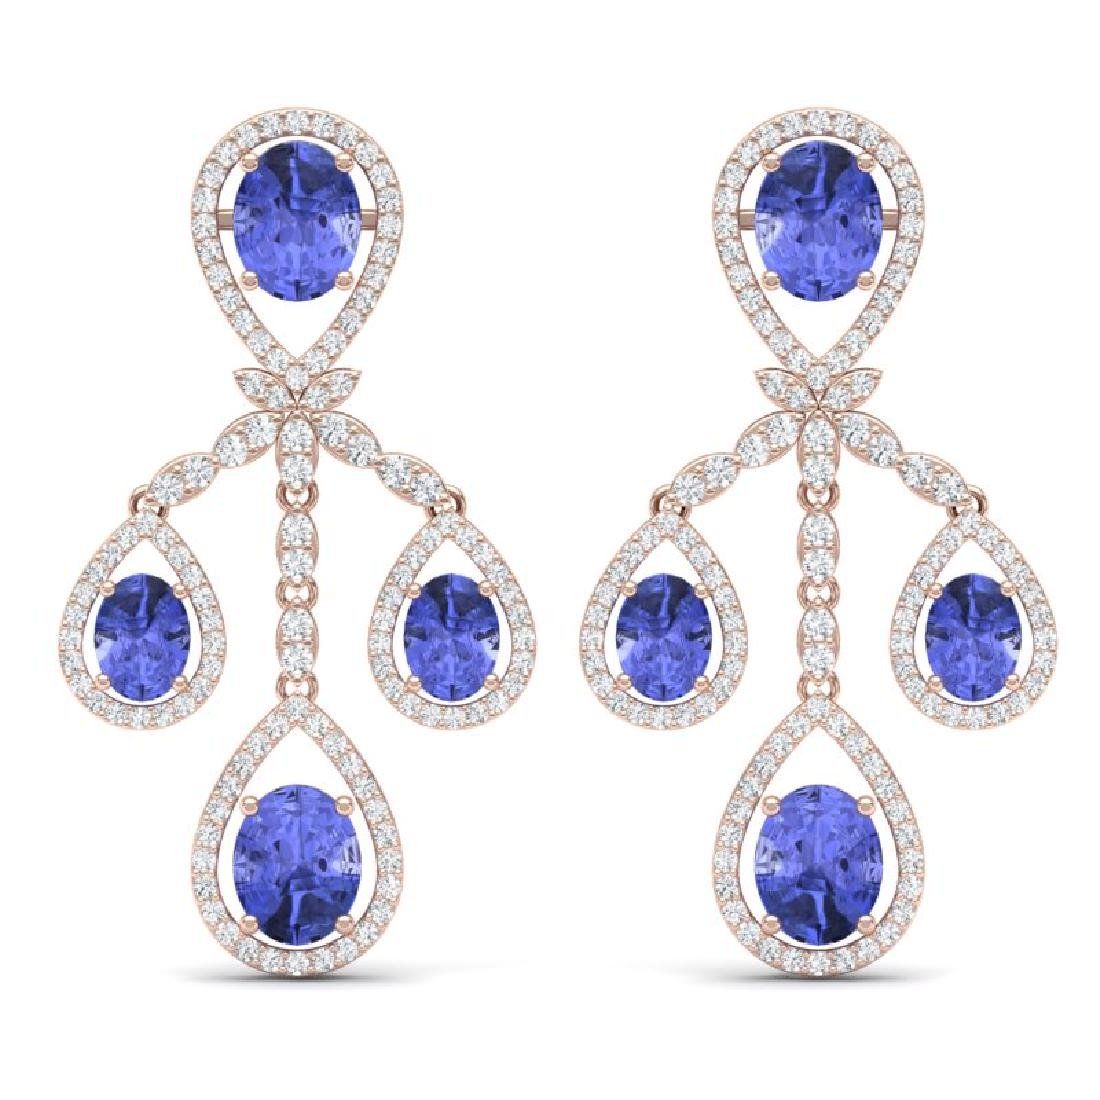 24.89 CTW Royalty Tanzanite & VS Diamond Earrings 18K